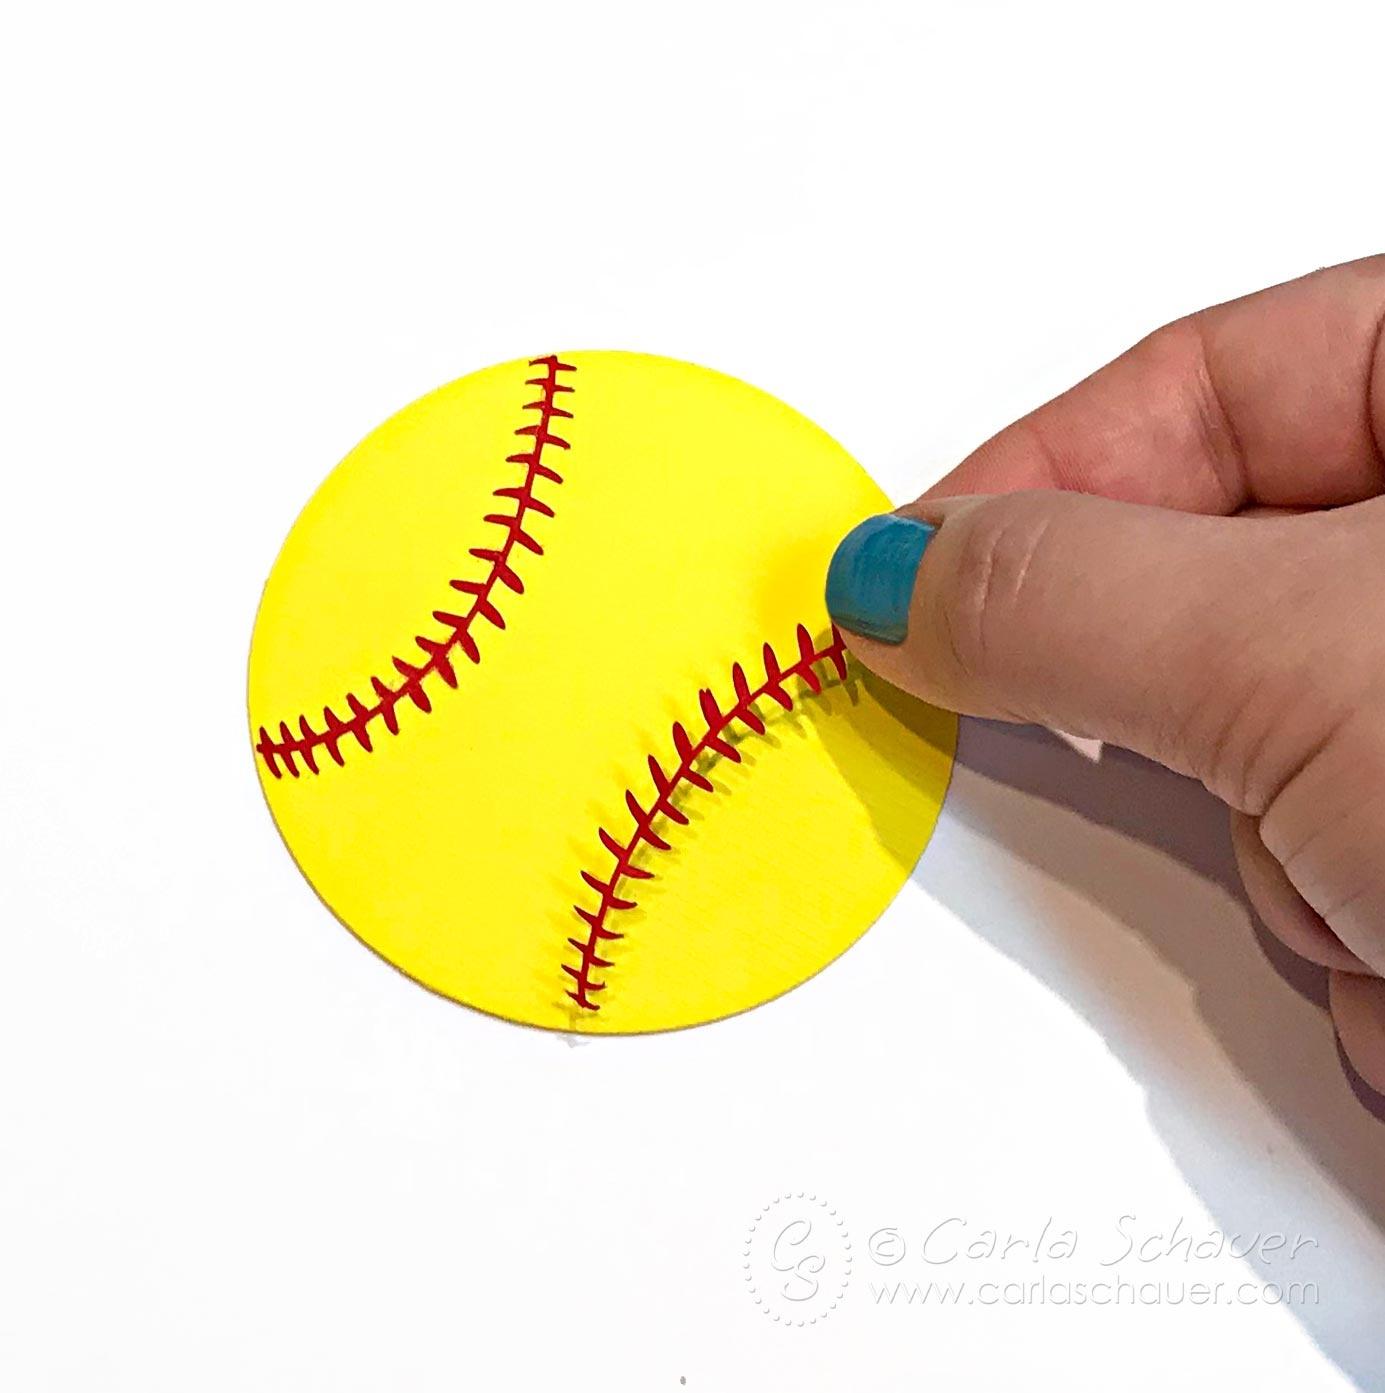 Softball Craft: Make A Softball Bag Tag | Carla Schauer Designs - Free Printable Softball Images